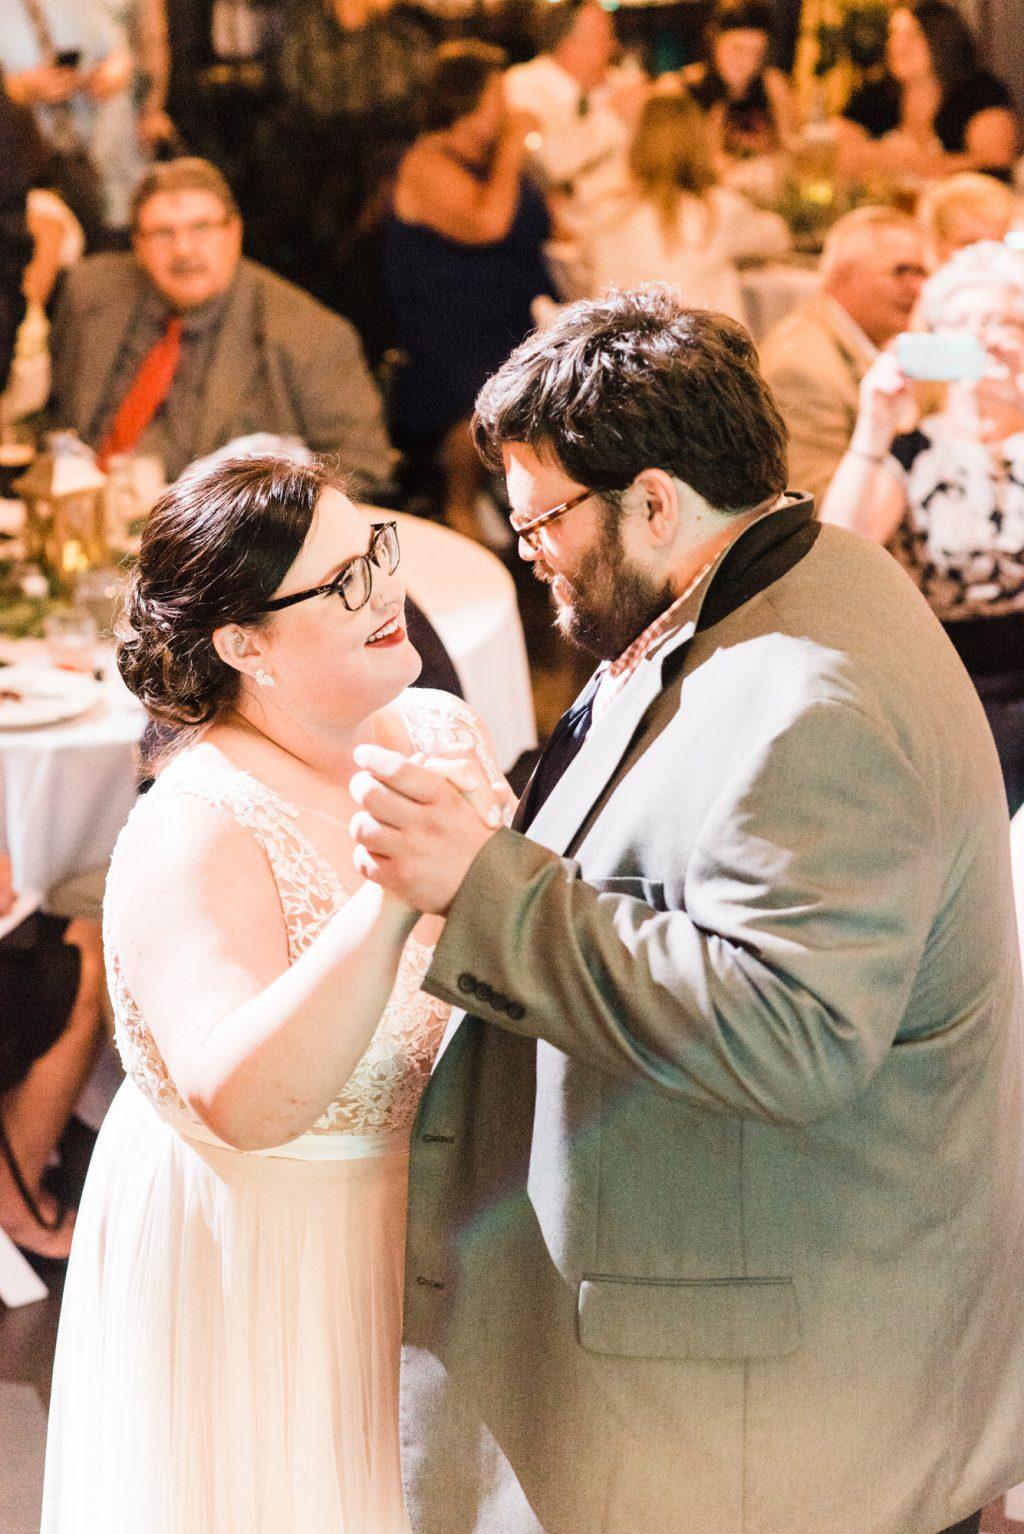 haley-richter-photo-west-chester-summer-wedding-boxcar-brewery-173